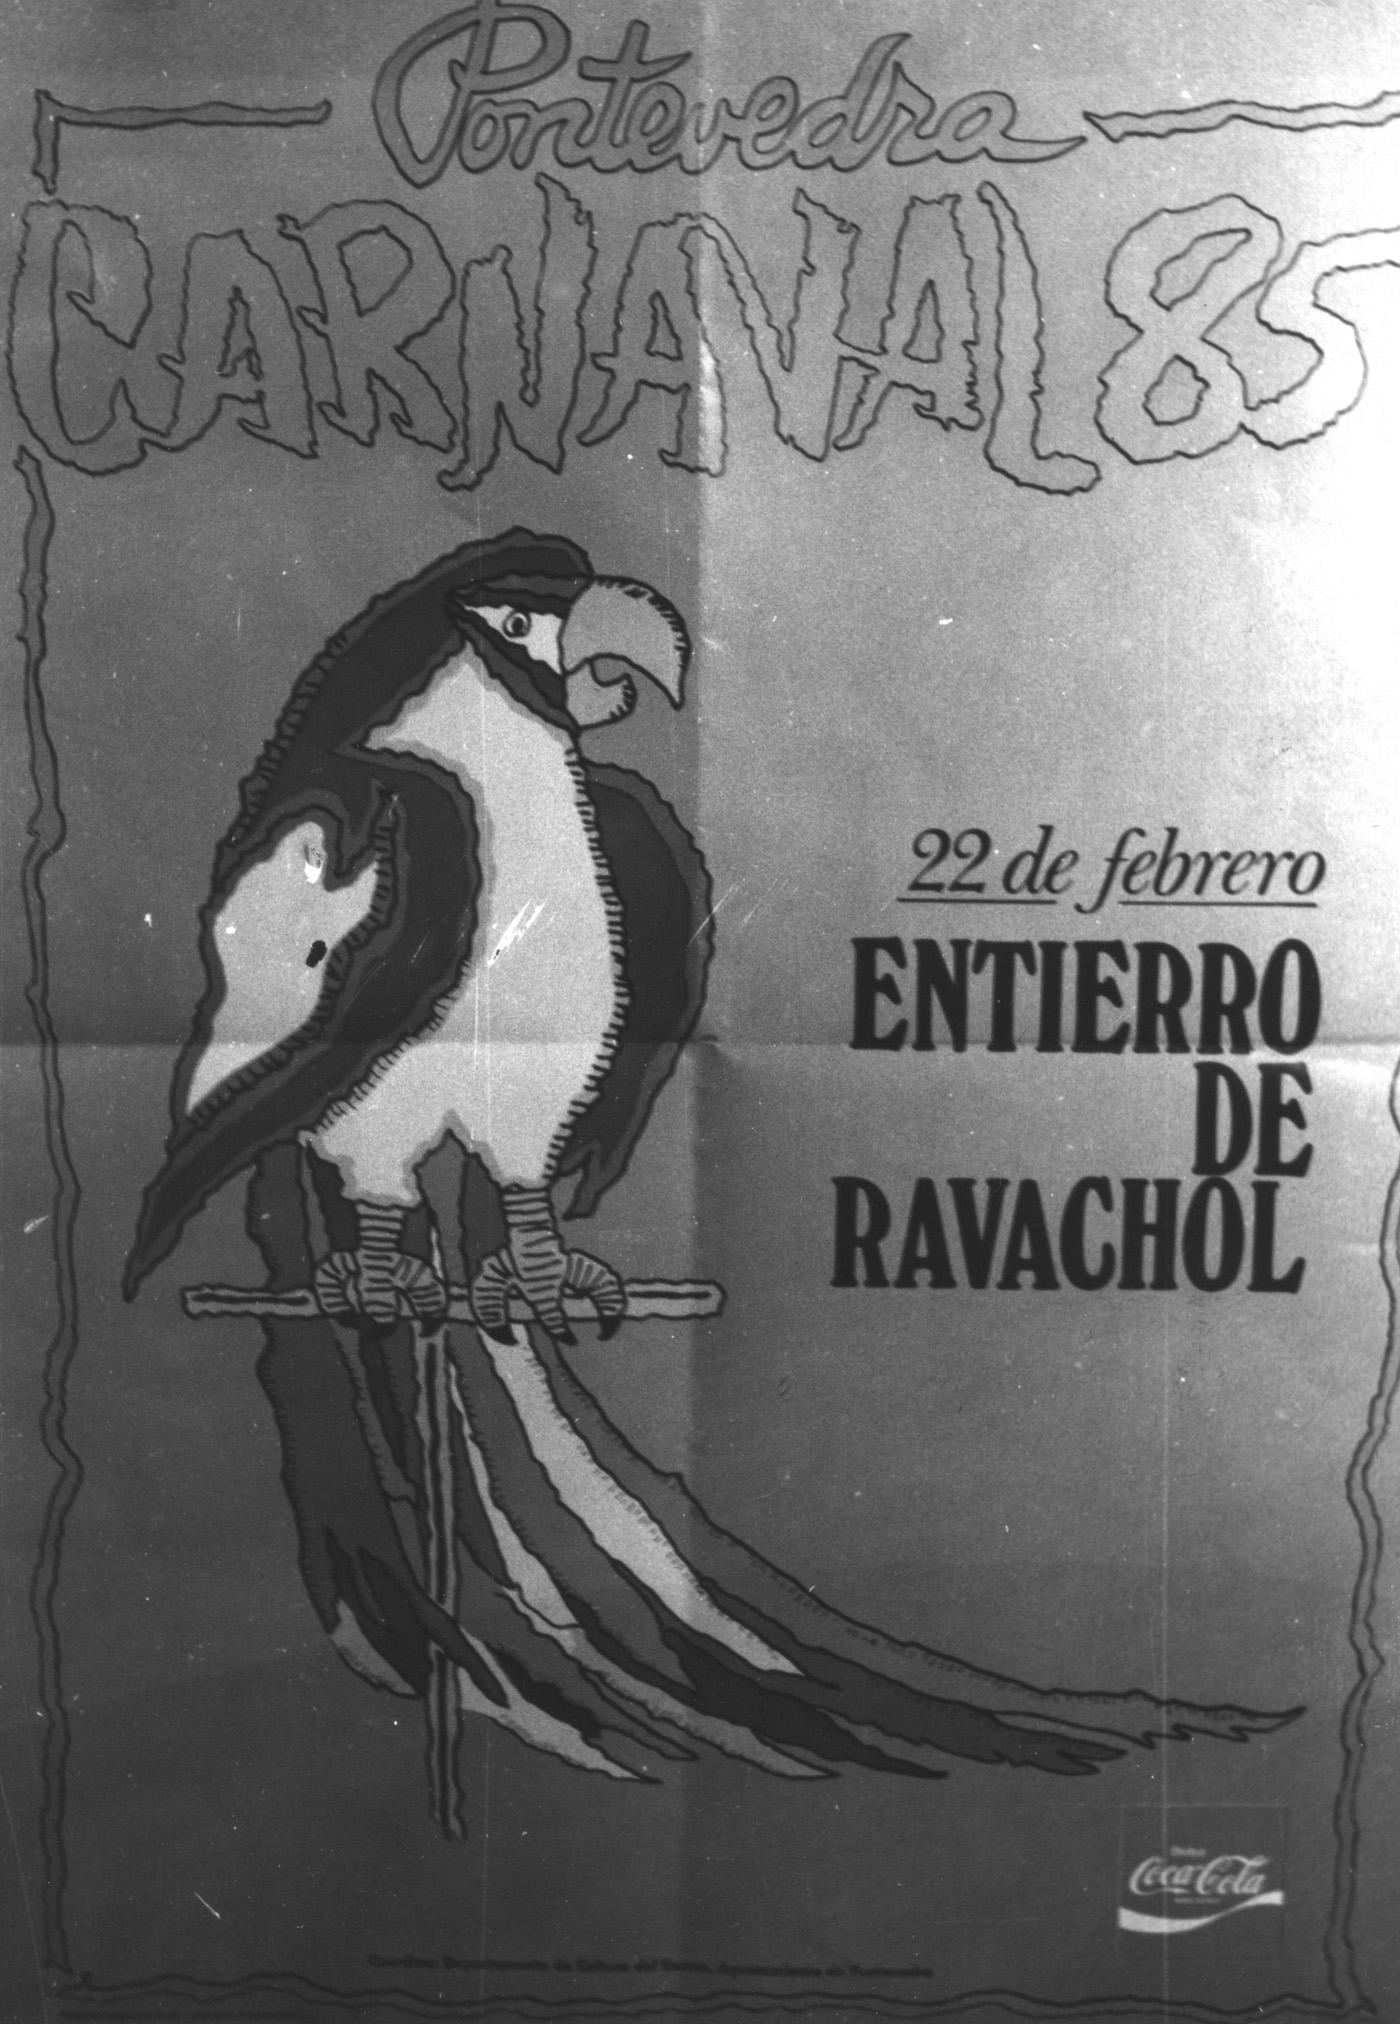 01.- CARTEL RAVACHOL, 1985. DIARIO DE PONTEVEDRA, RAFA VÁZQUEZ